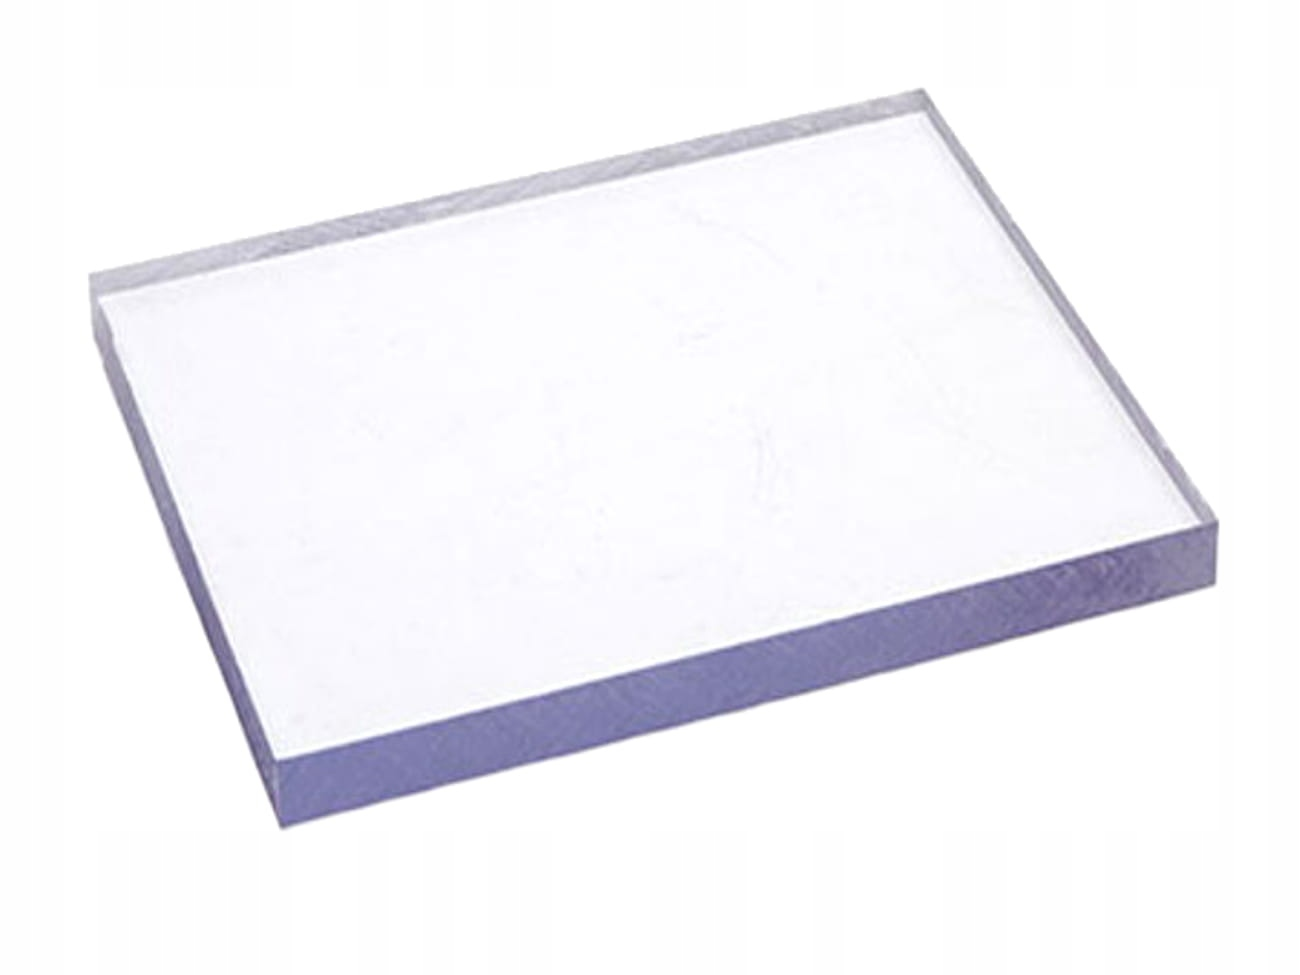 Оргстекло Plexiglass Pmma бесцветное 3 мм на размер